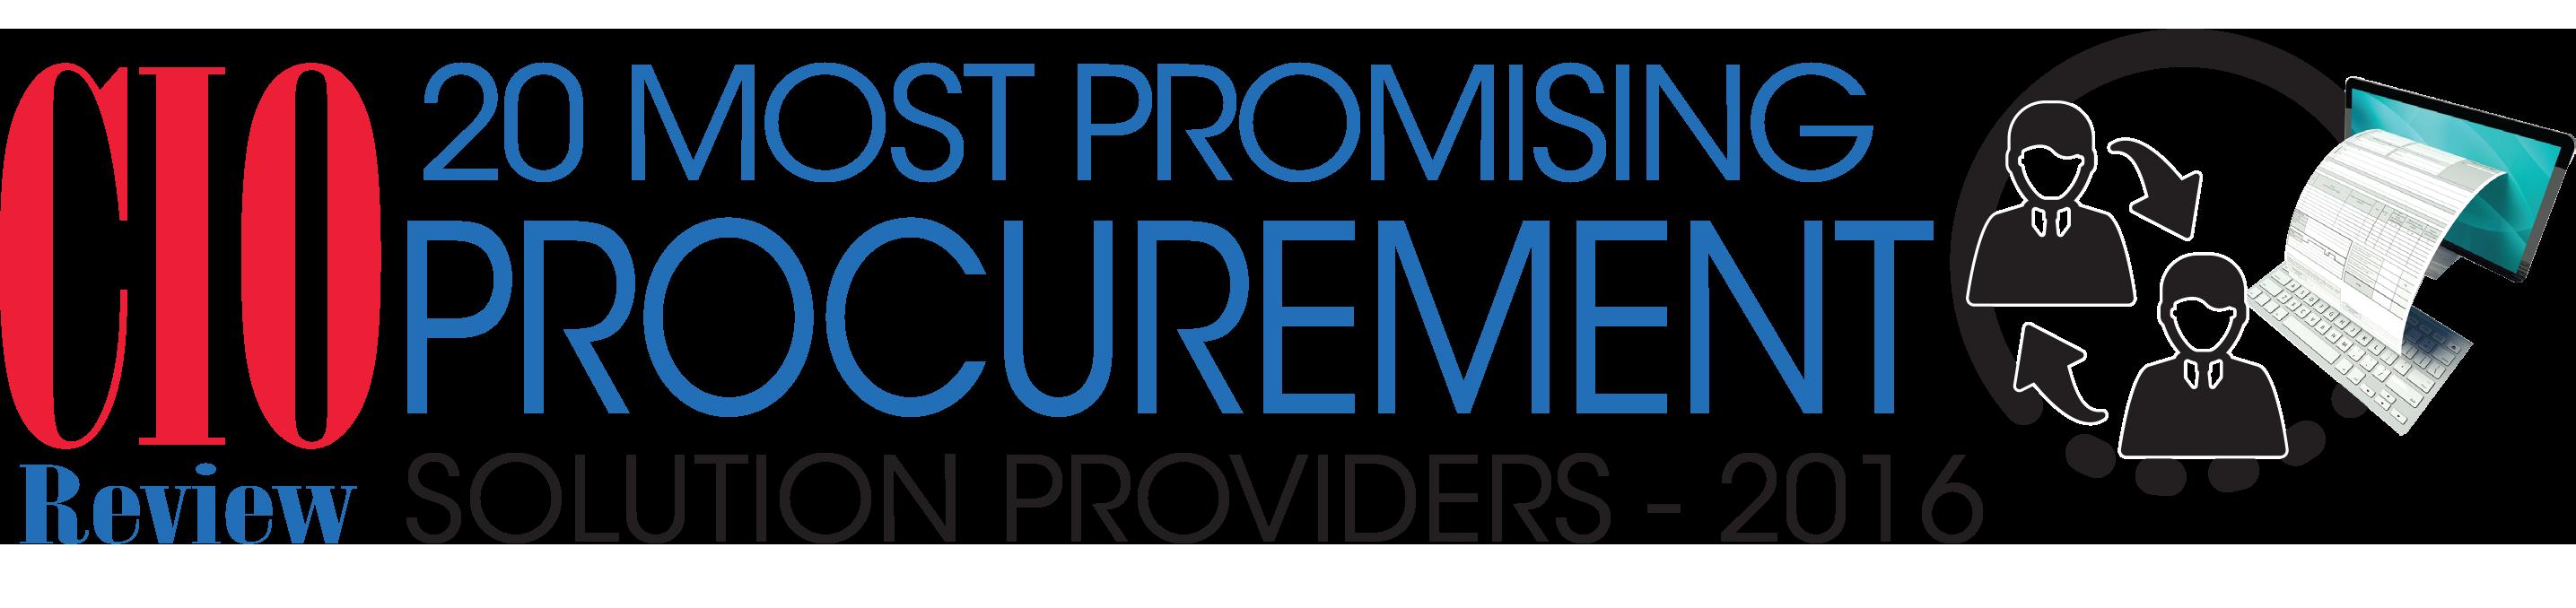 procurement-logo-2016.png